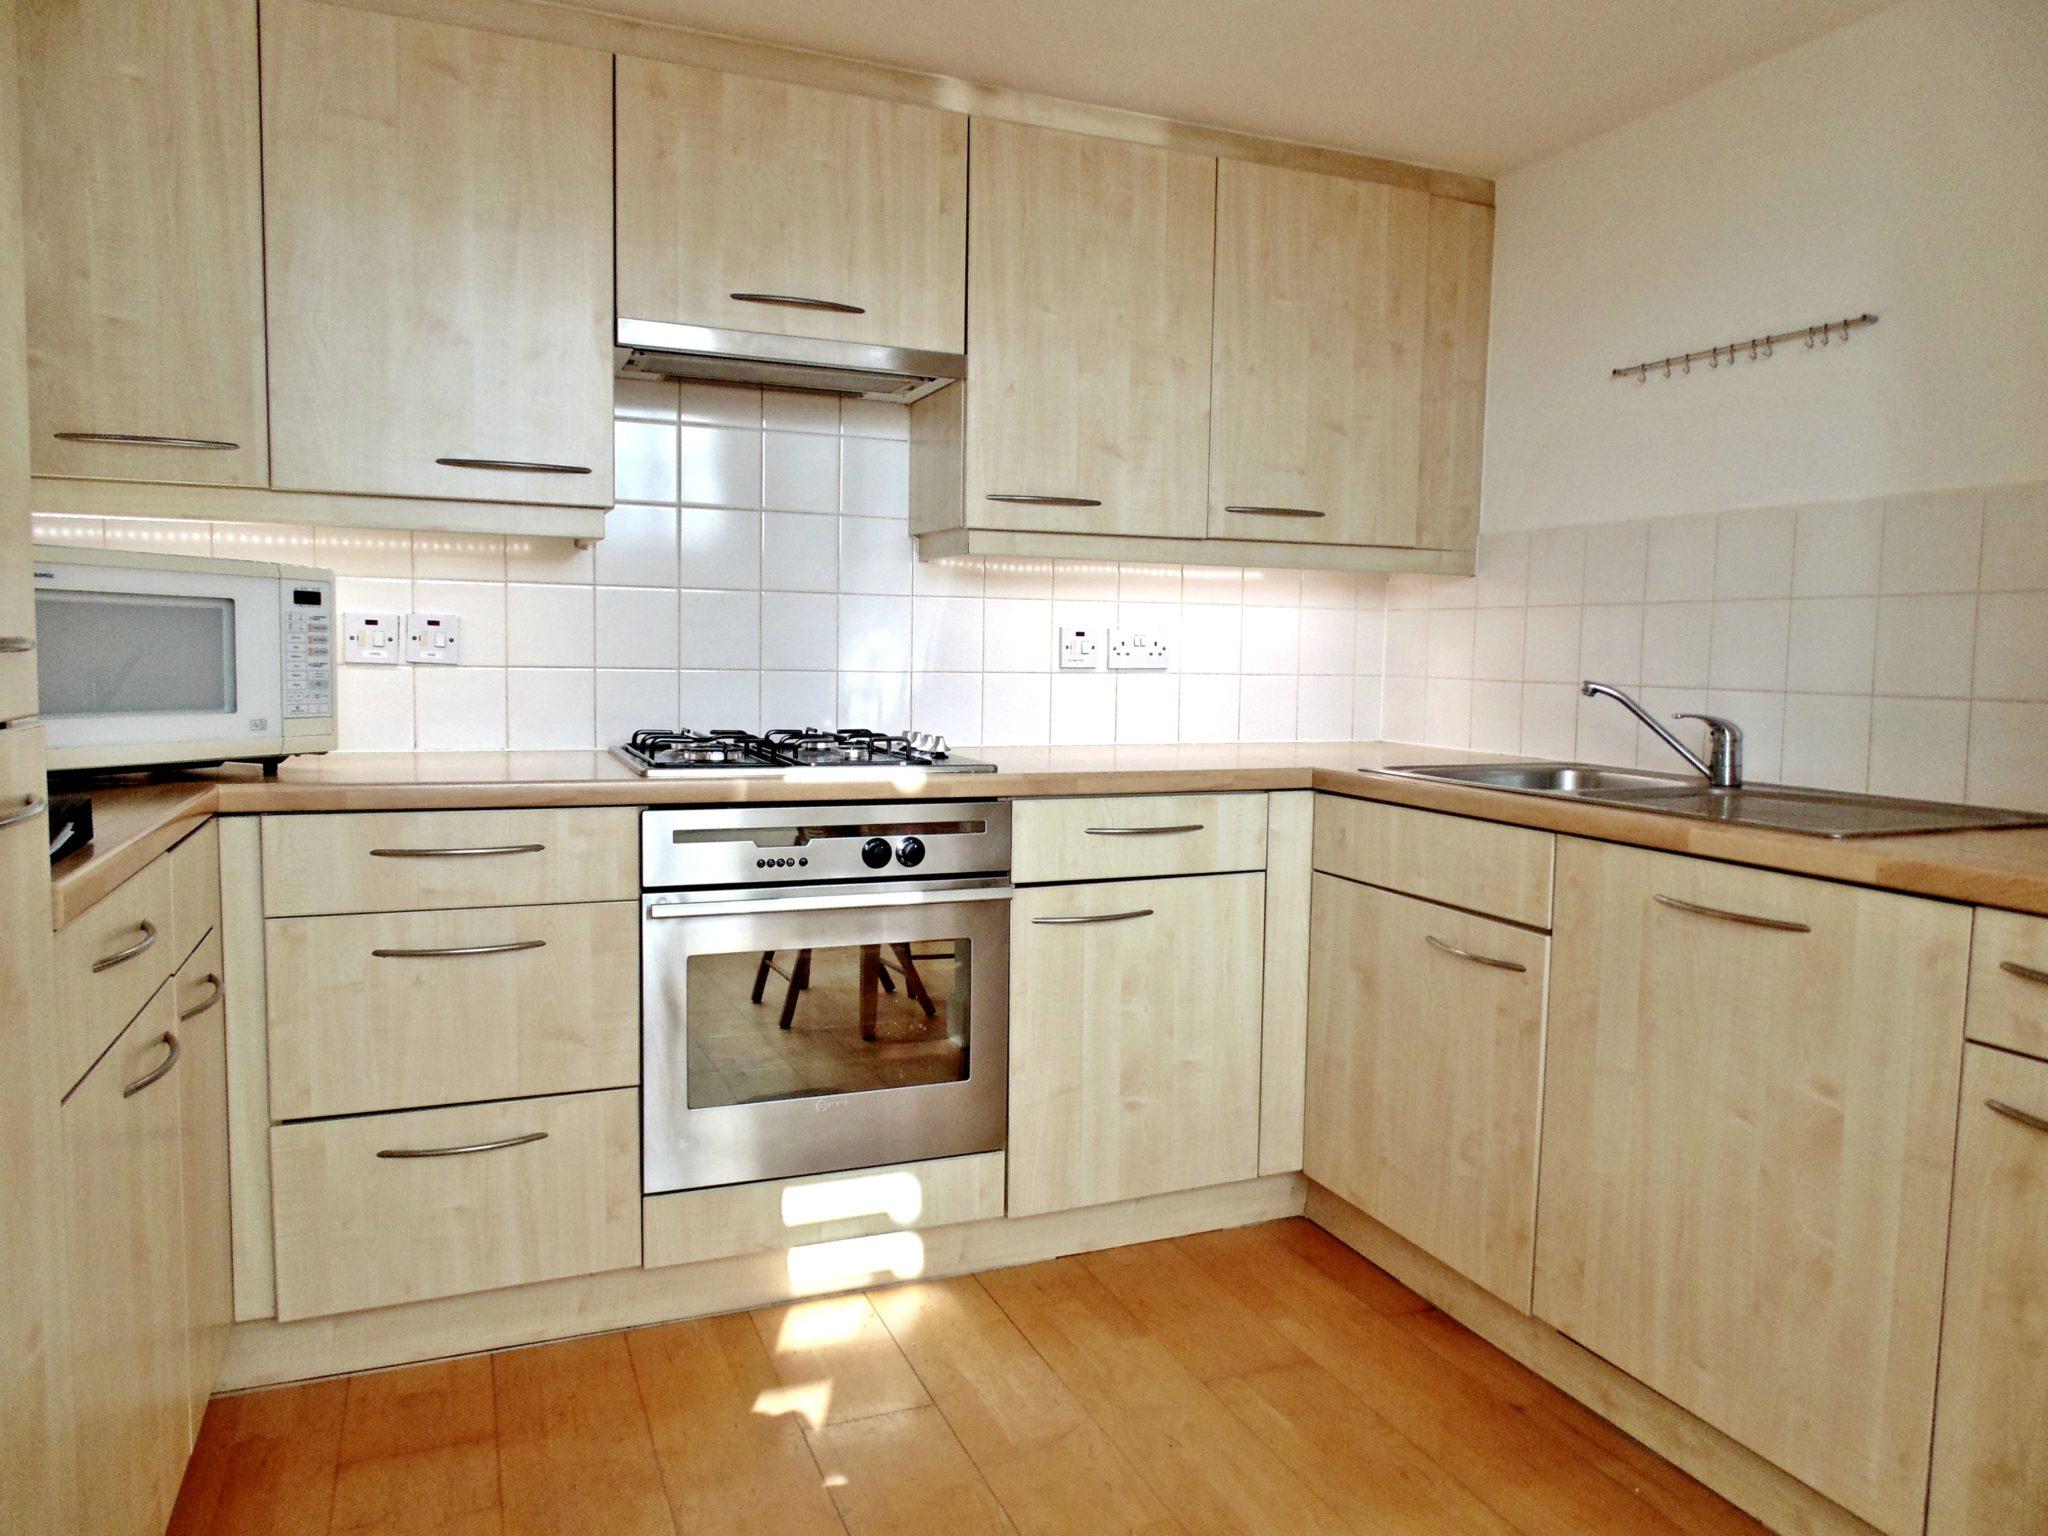 North-London-Accommodation---York-Way-Apartments- -Cheap-Hotel-Alternative-Accommodation-London---Serviced-Apartments-King's-Cross---free-Wifi- -Urban-Stay